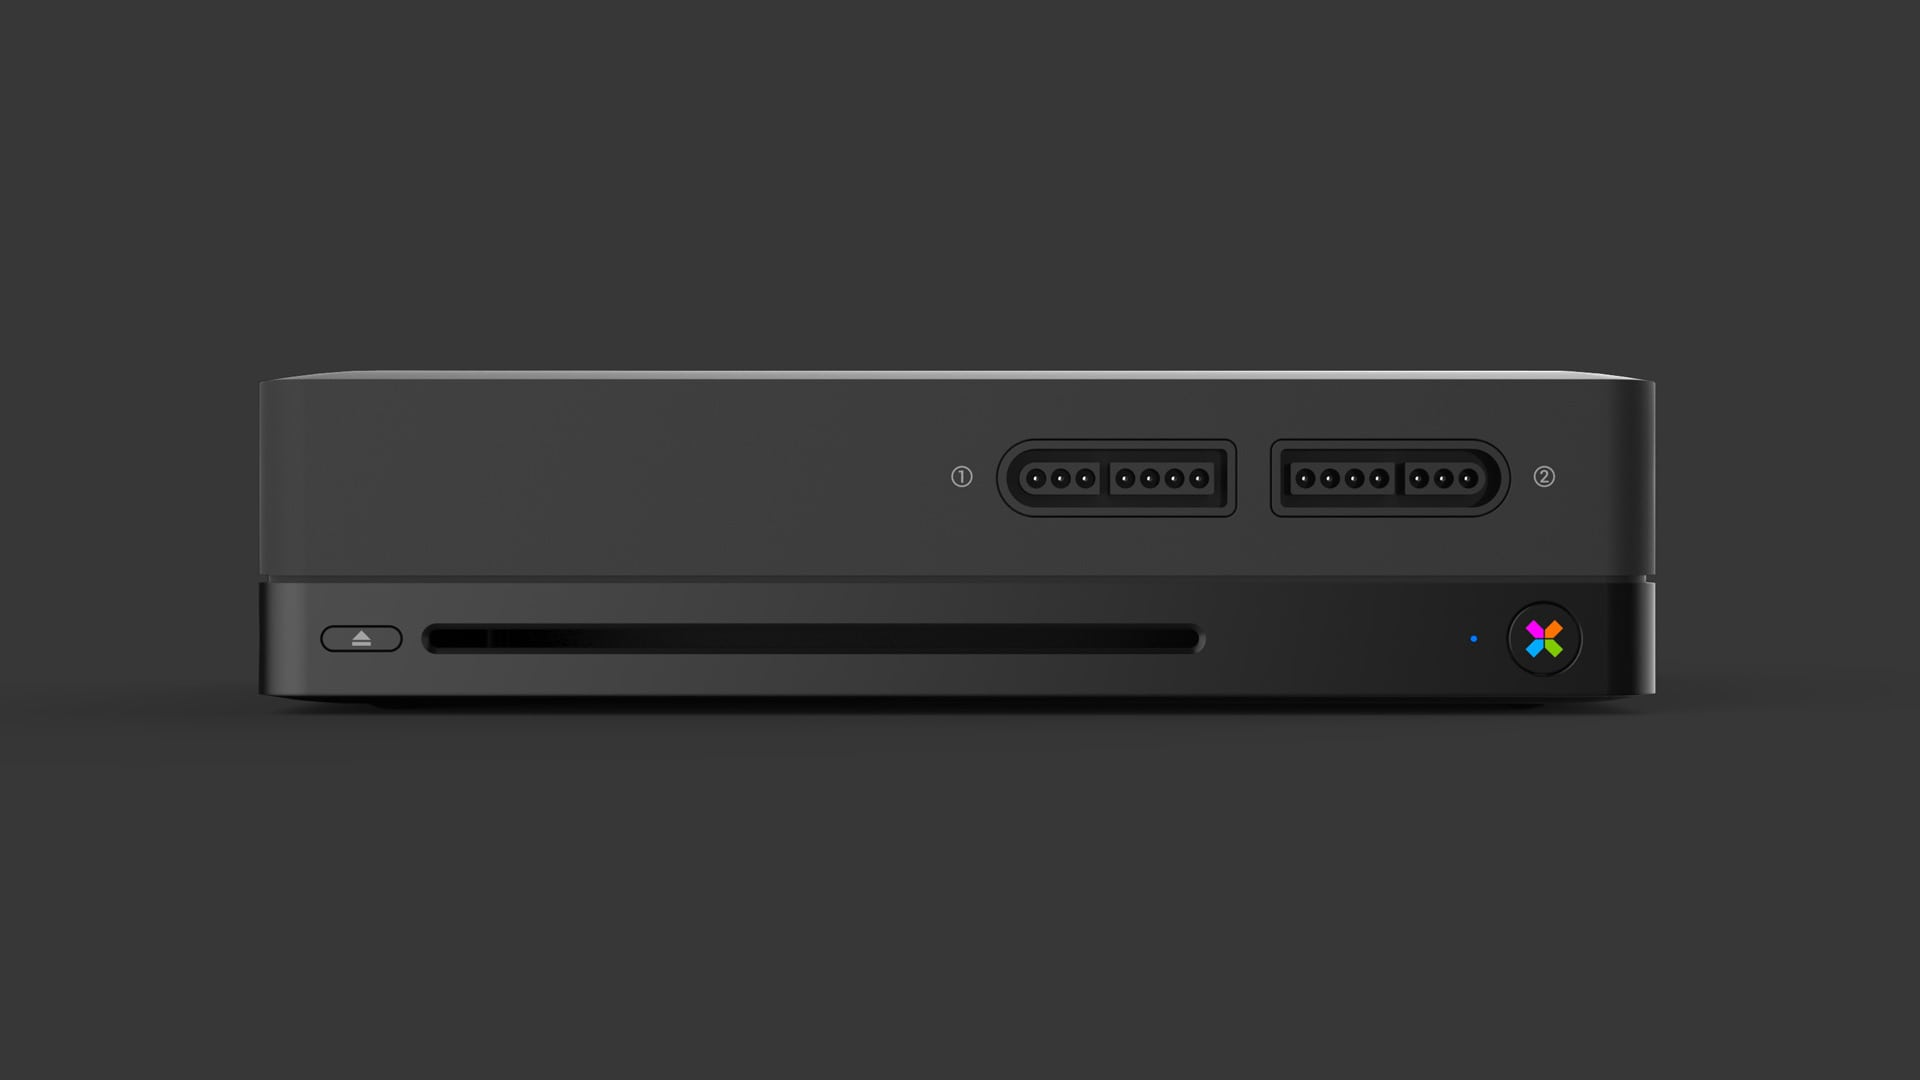 7 rbxpress web - Nowa konsola Polymega ze wsparciem m.in. dla PlayStation oraz Sega Saturn